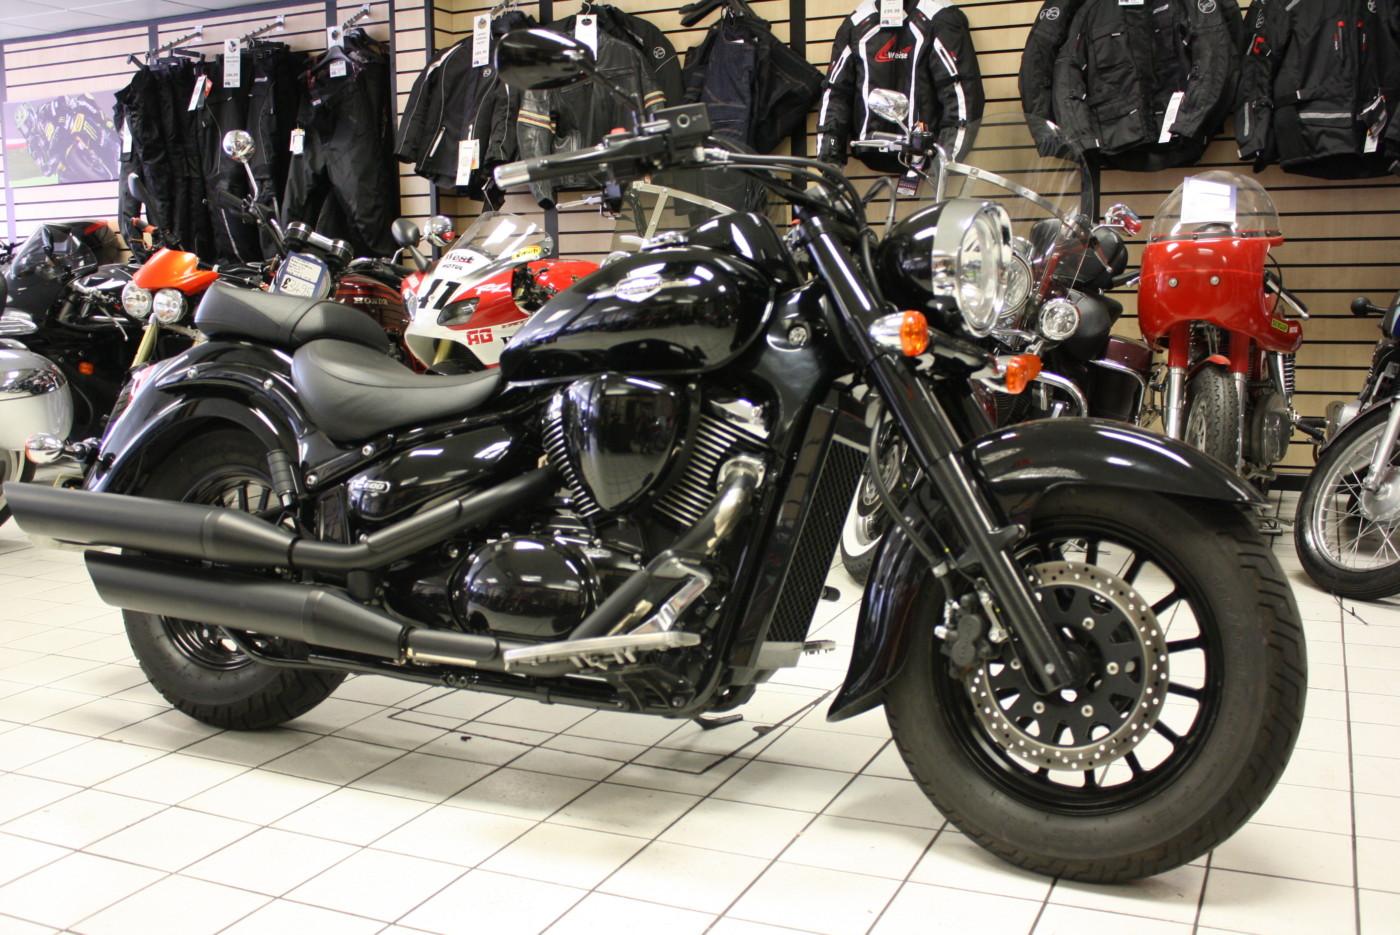 Suzuki VL800 Intruder C800 Black